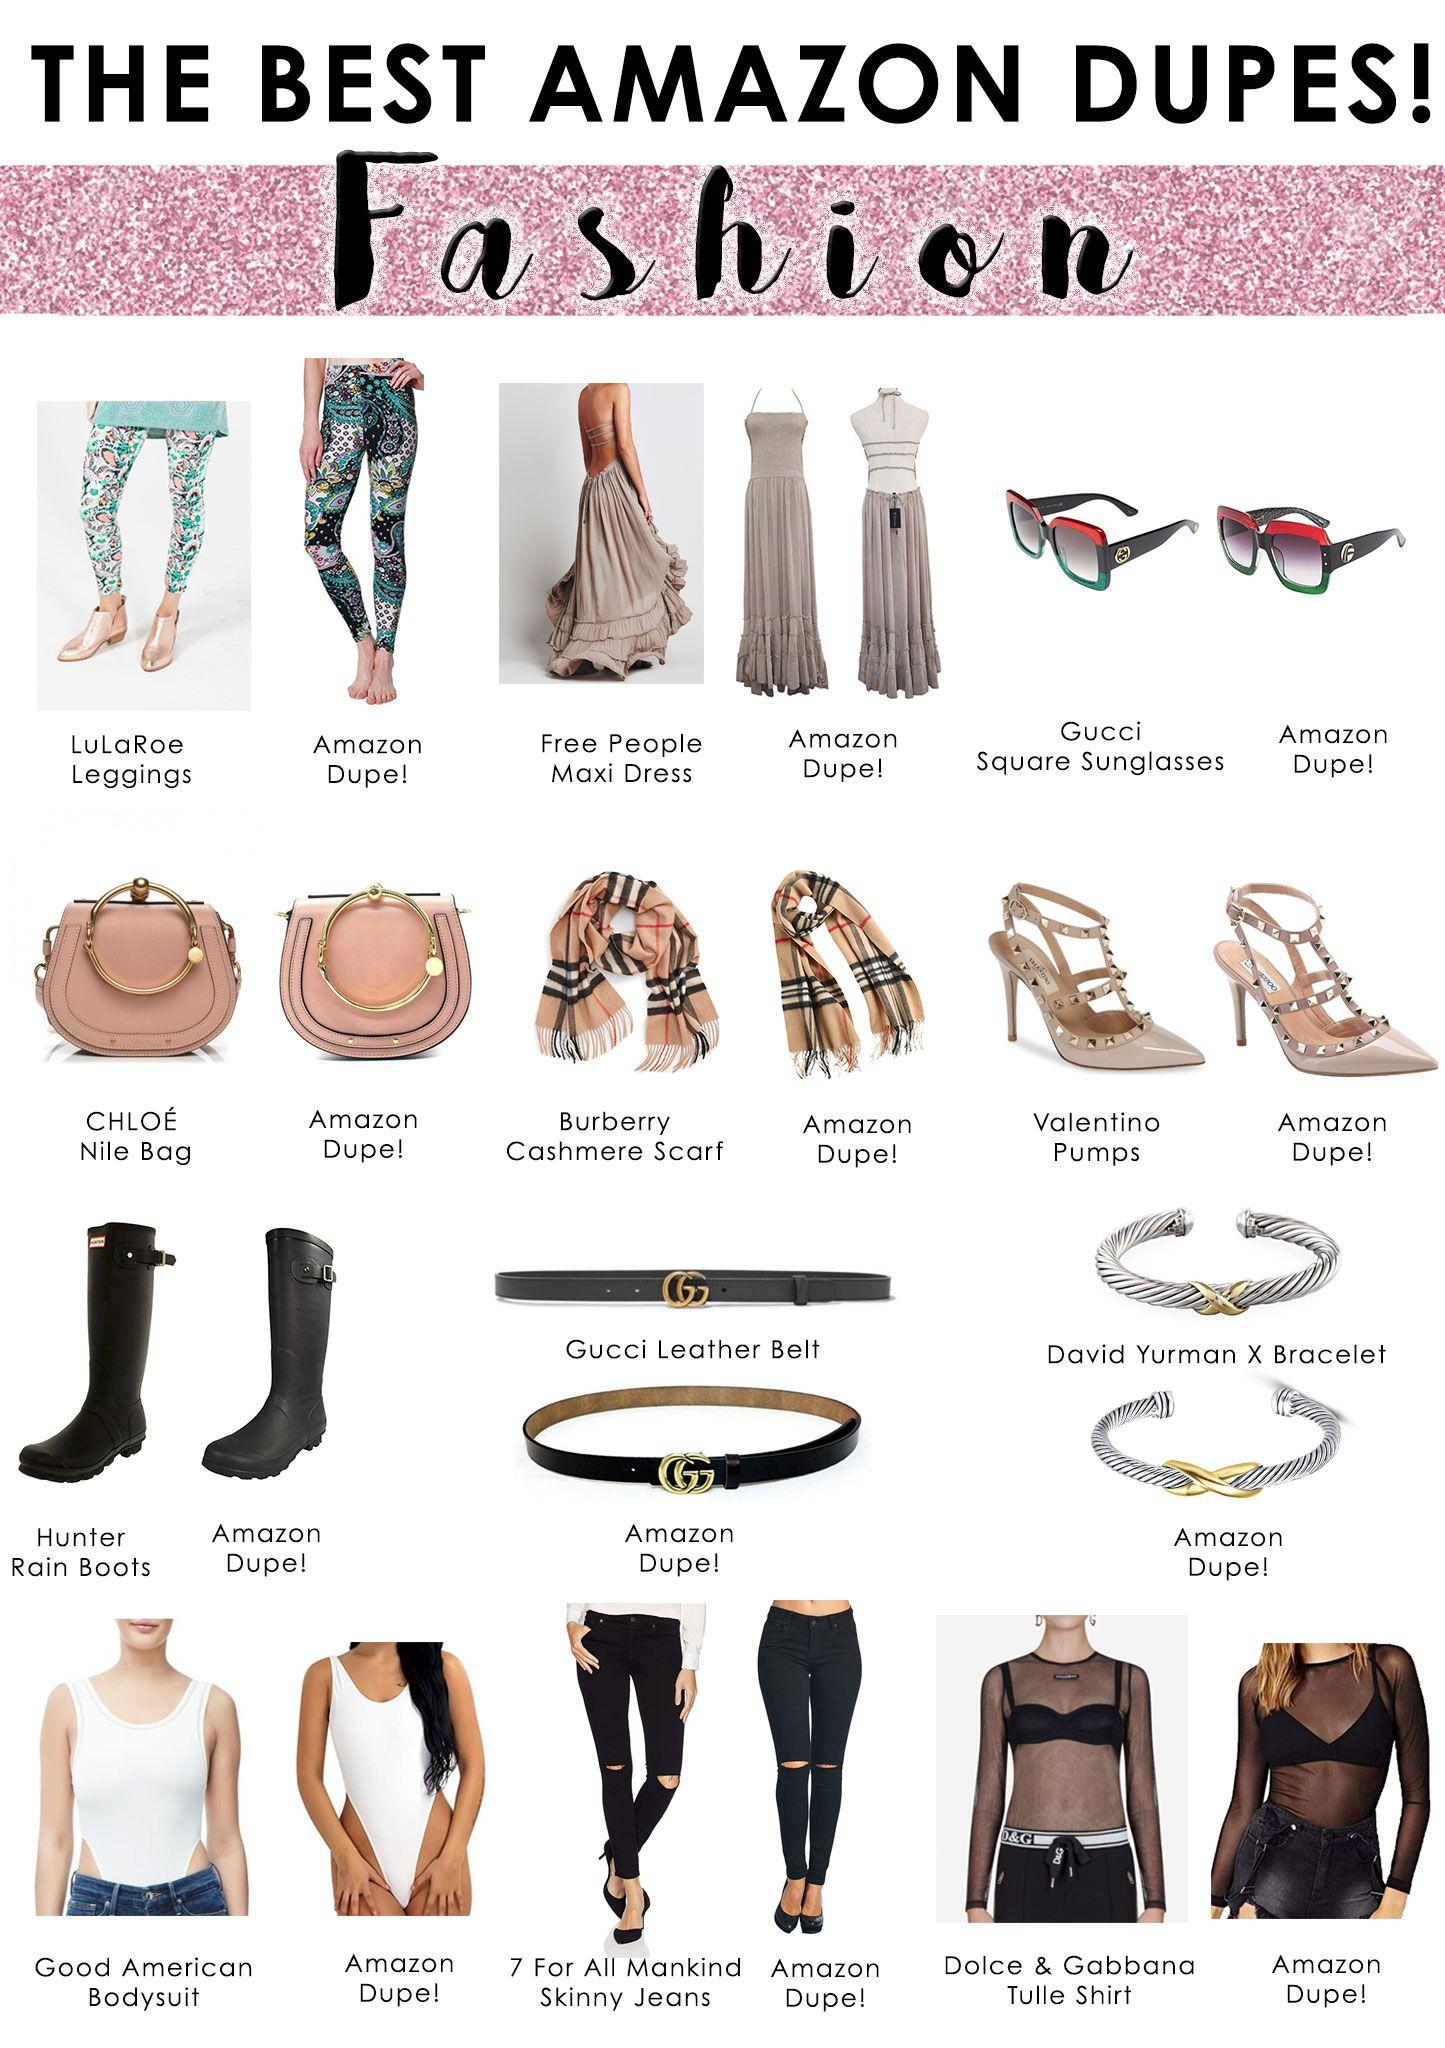 b0de6dcd76502 LuLaRoe leggings dupe, LuLaRoe leggings knockoff, Free People maxi dress,  Amazon dress,